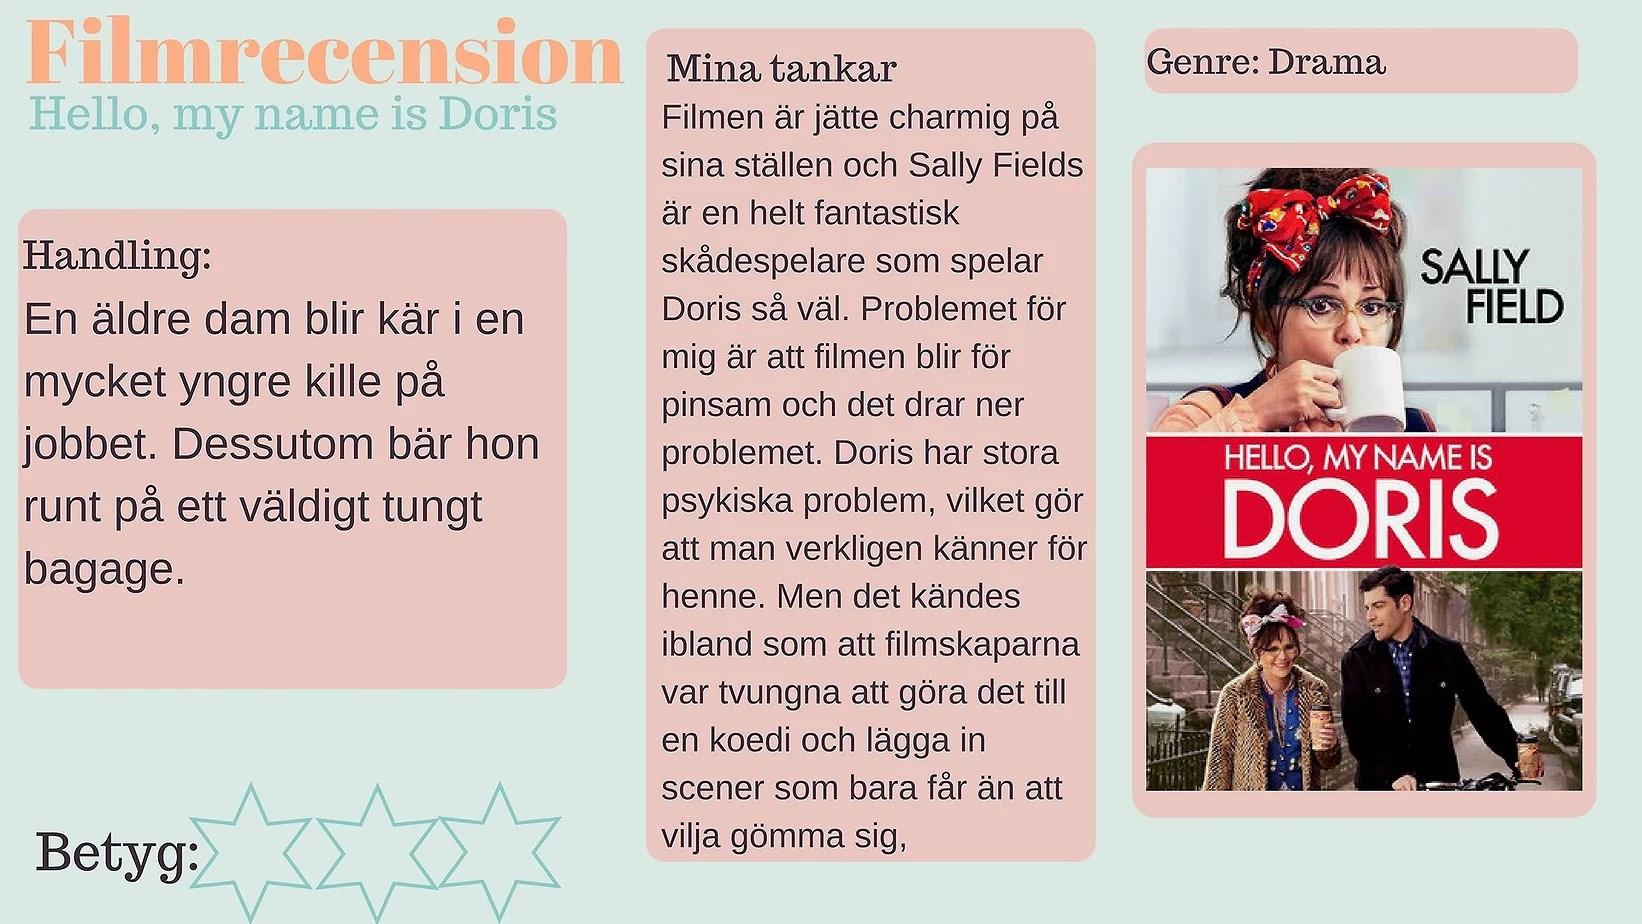 Filmrecension - Hello, my name is Doris